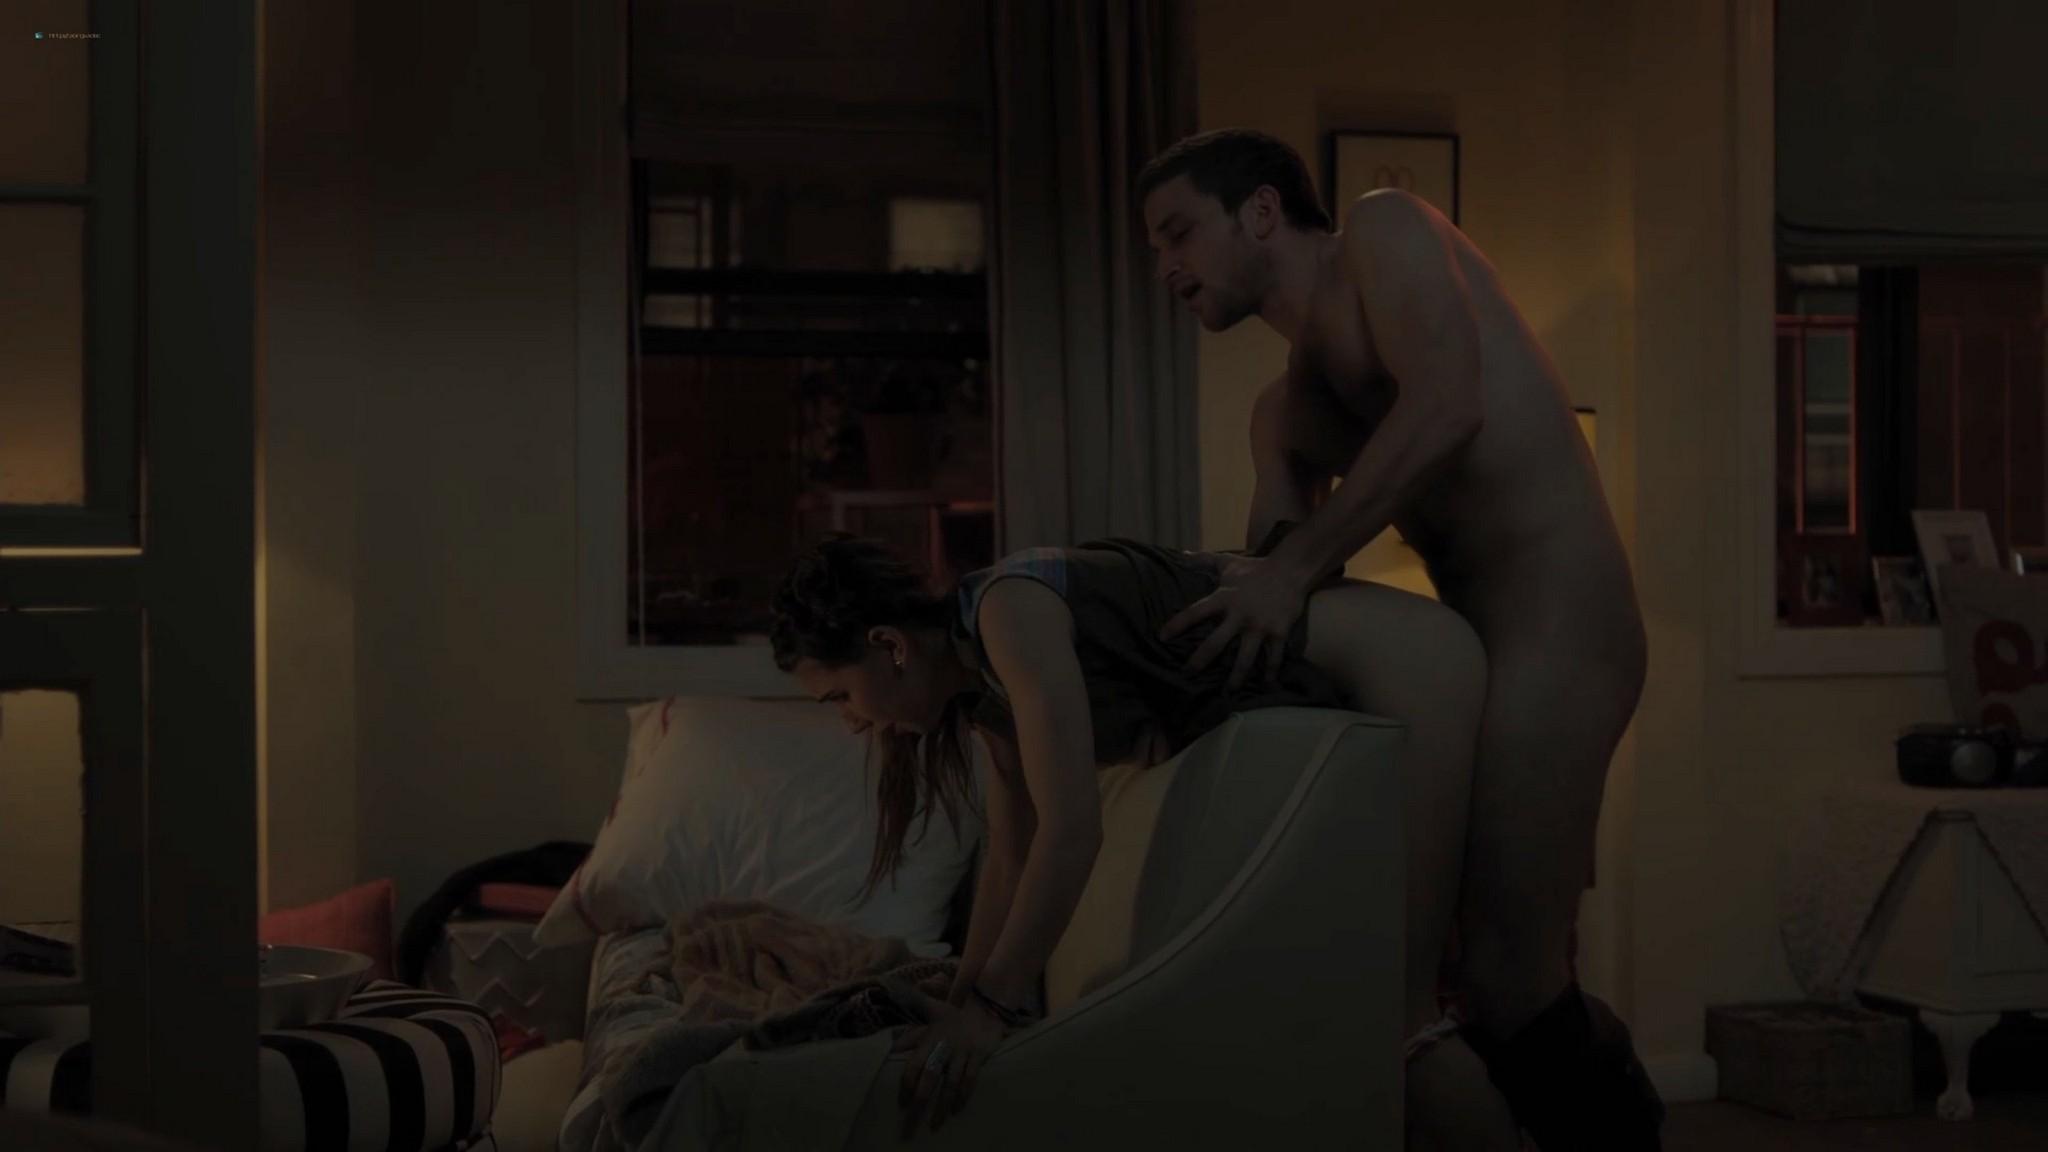 Allison Williams hot sex Lena Dunham naked Zosia Mamet sex doggy style Girls 2012 s3e6 12 1080p Web 5